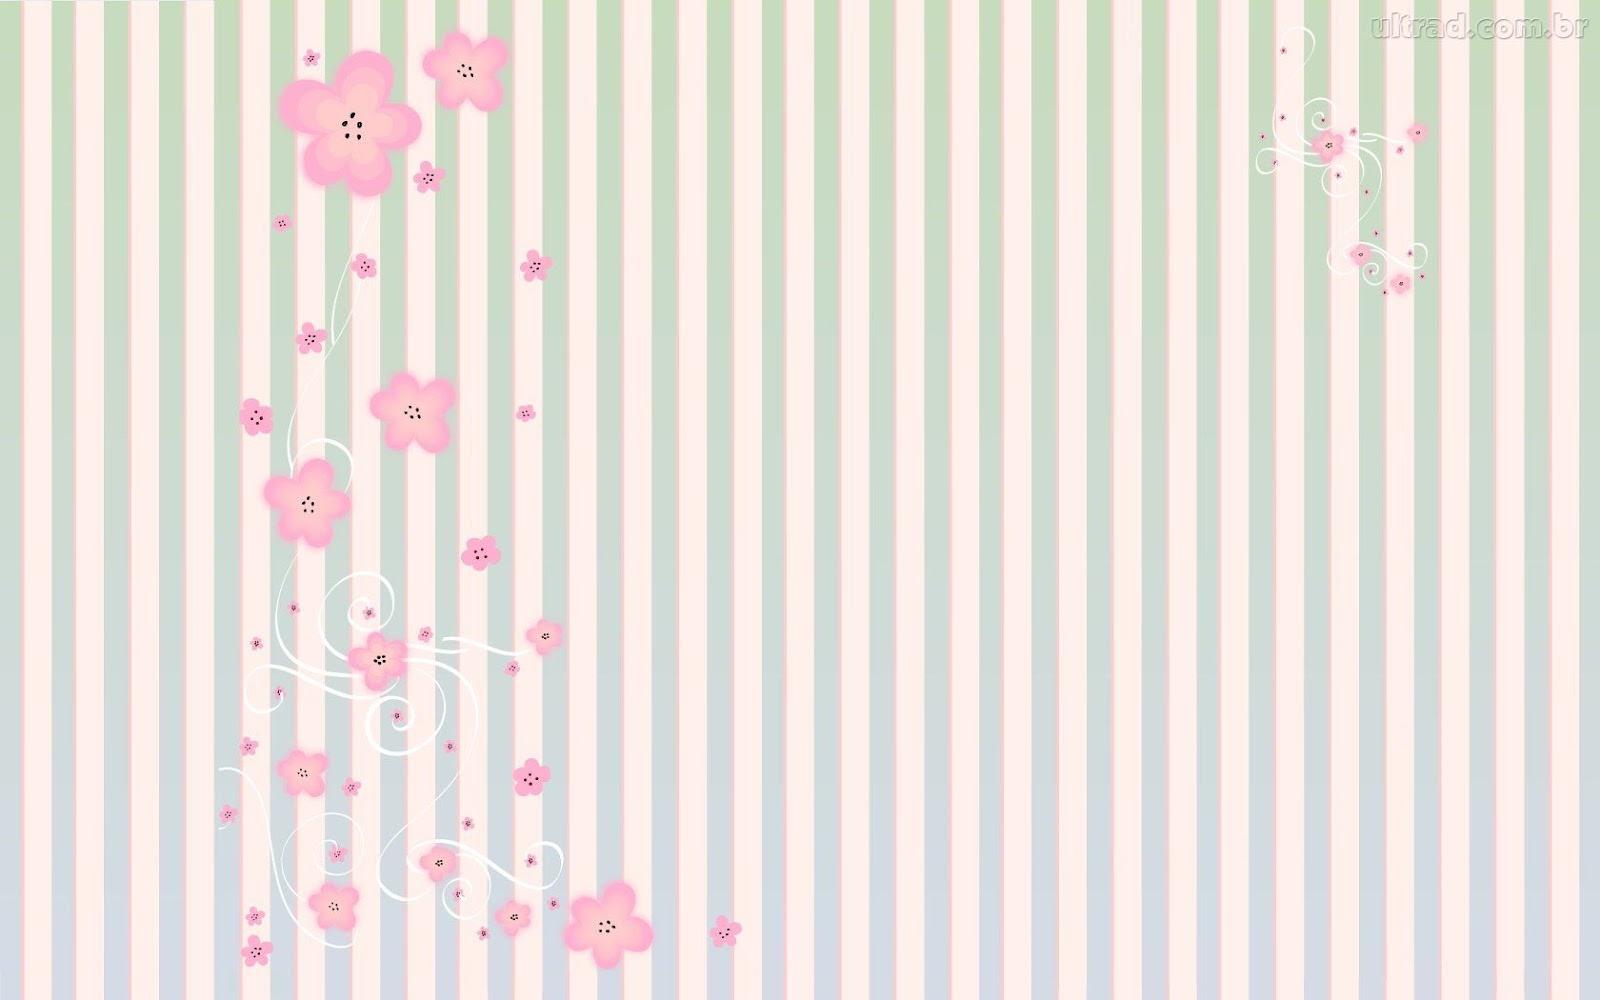 Flores de papel on pinterest tattoo design bild - Manualidades en papel ...